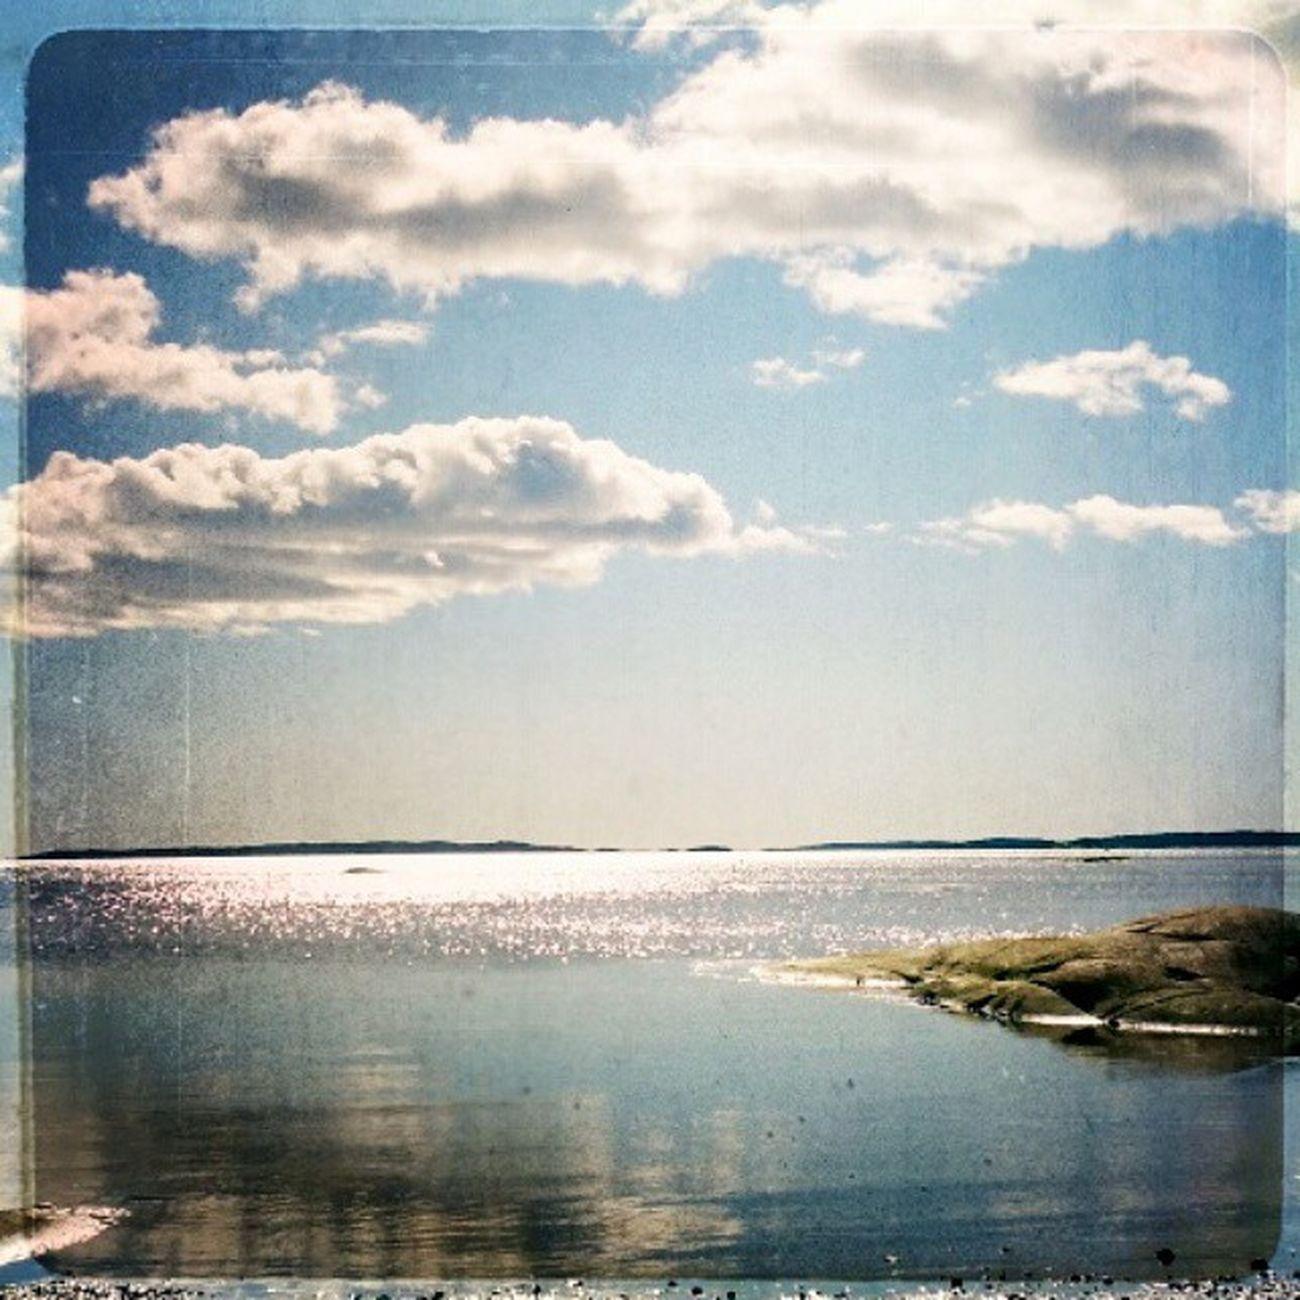 Halden Sun Lovely Mytown Norway Kålvika easter sea skye water blueSky lovelyDay daytrip spring out vår blue Østfold nrkØstfold påskevær